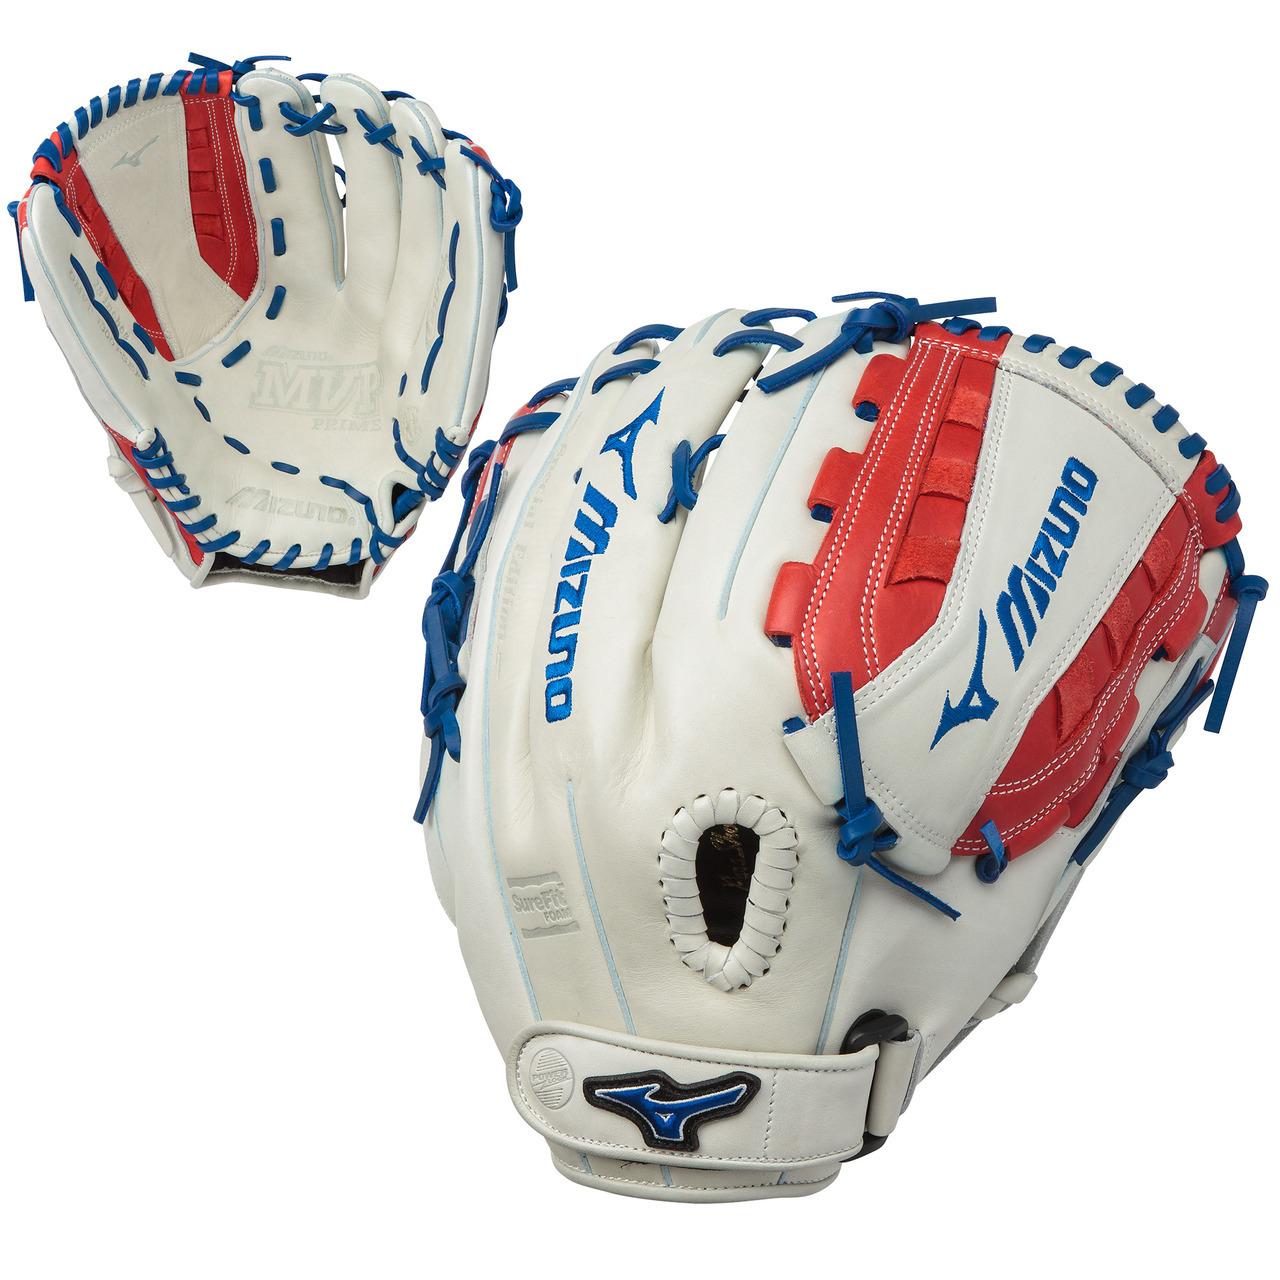 mizuno-mvp-prime-se-12-inch-gmvp1200psef5-fastpitch-softball-glove-right-hand-throw GMVP1200PSEF5-SIRDNY-RightHandThrow Mizuno 889961059650 The all new MVP Prime SE fastpitch softball series gloves feature